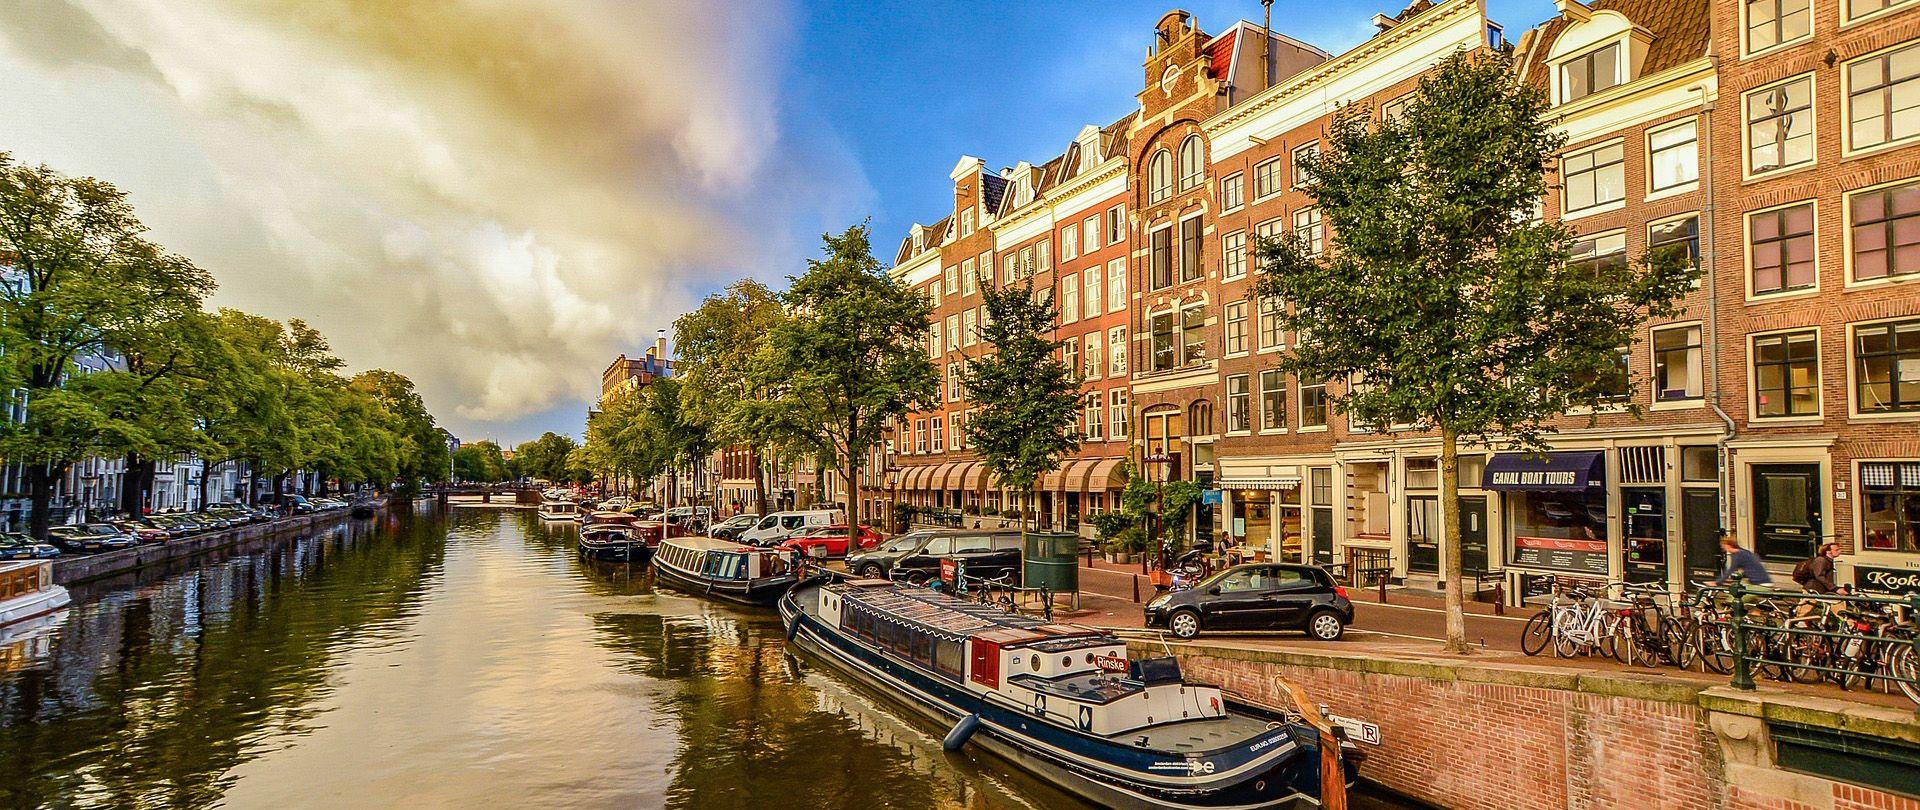 Similarities between Dutch and English